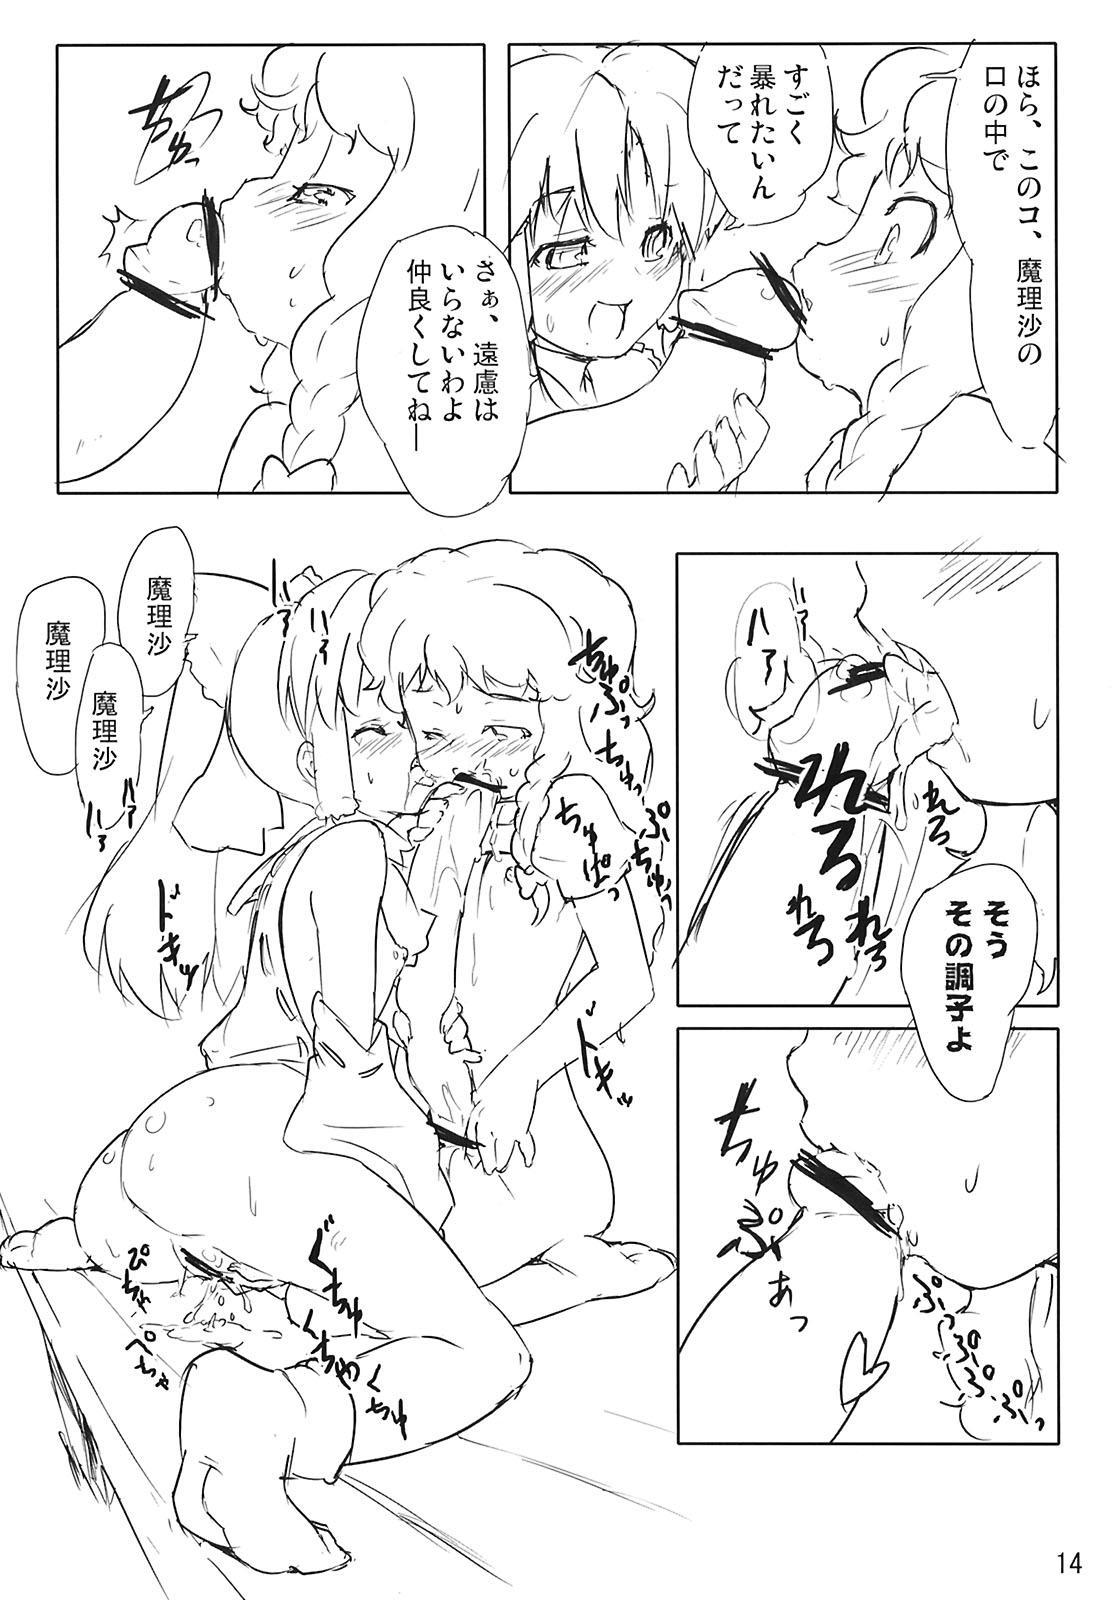 Kirisame Kinoko Jiken - cream of mushroom soup 13